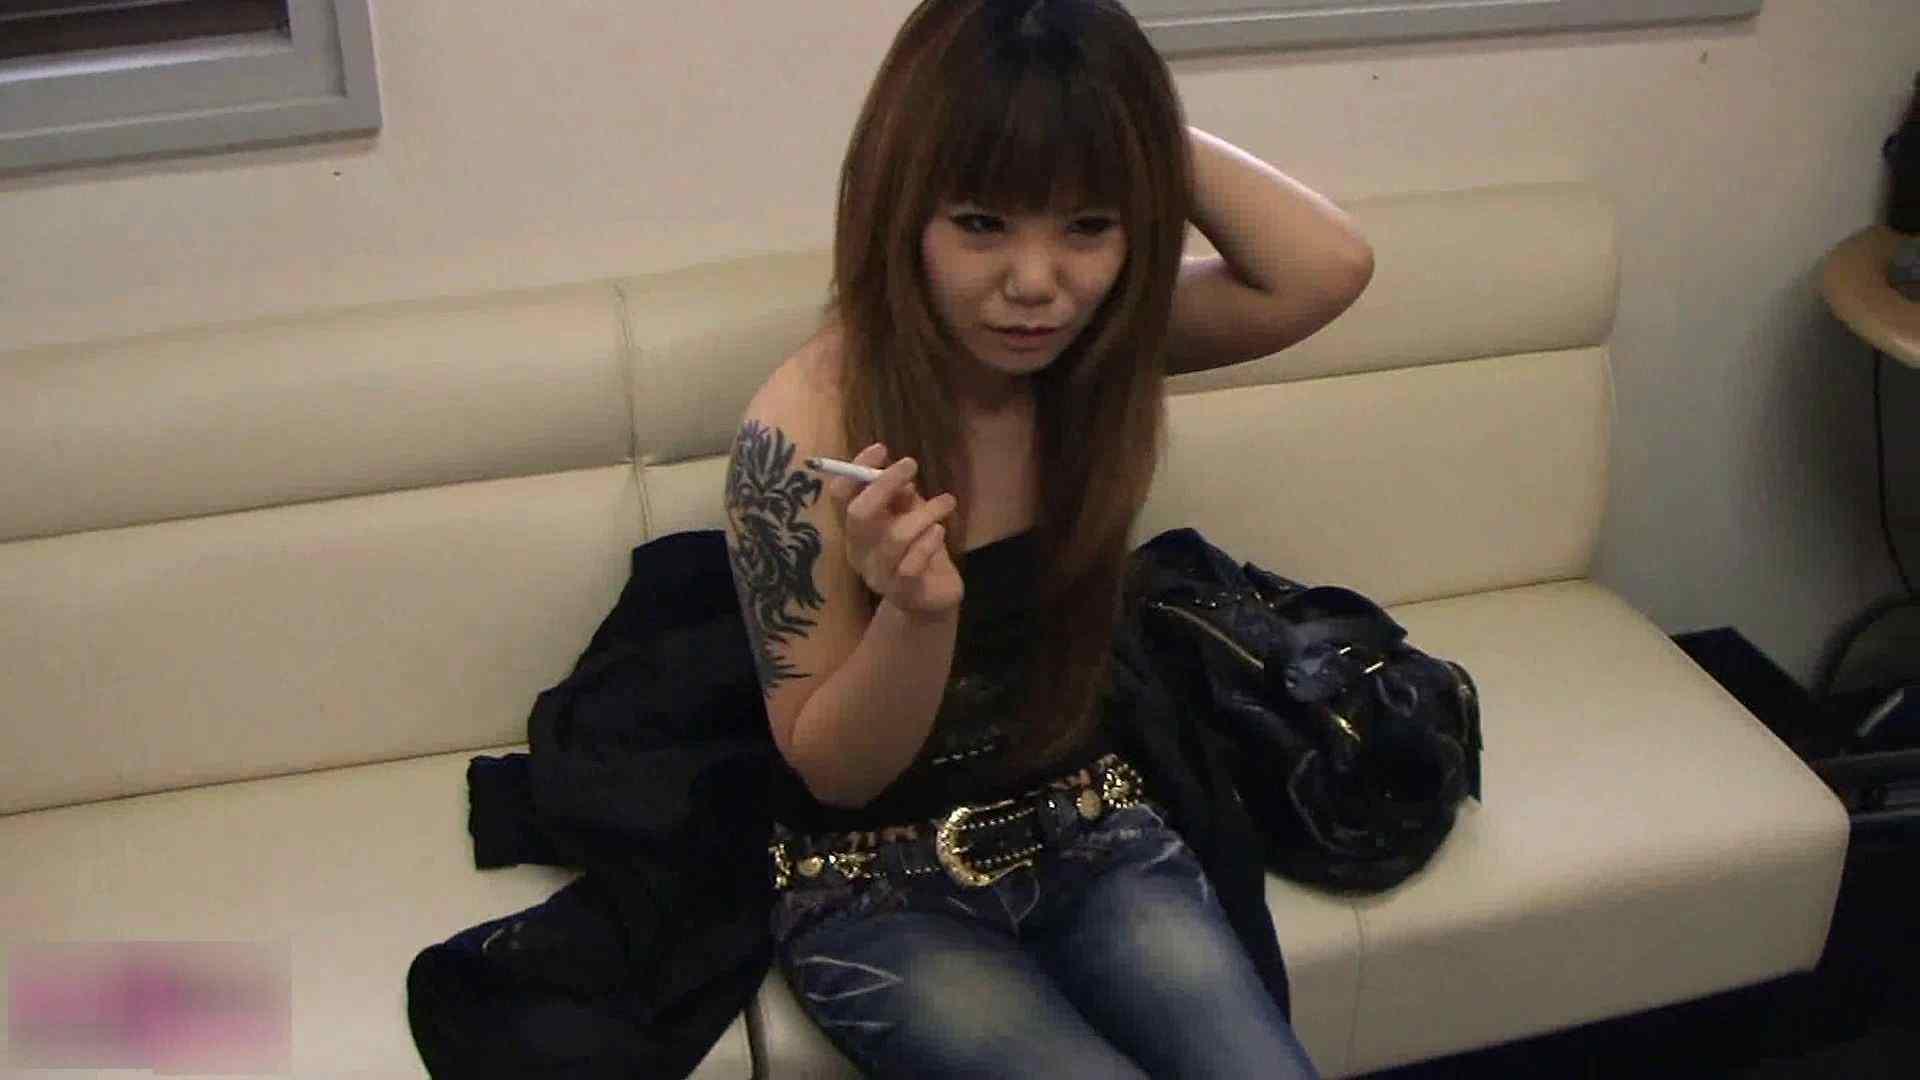 S級厳選美女ビッチガールVol.04 モデルのエッチ オメコ動画キャプチャ 103PIX 31